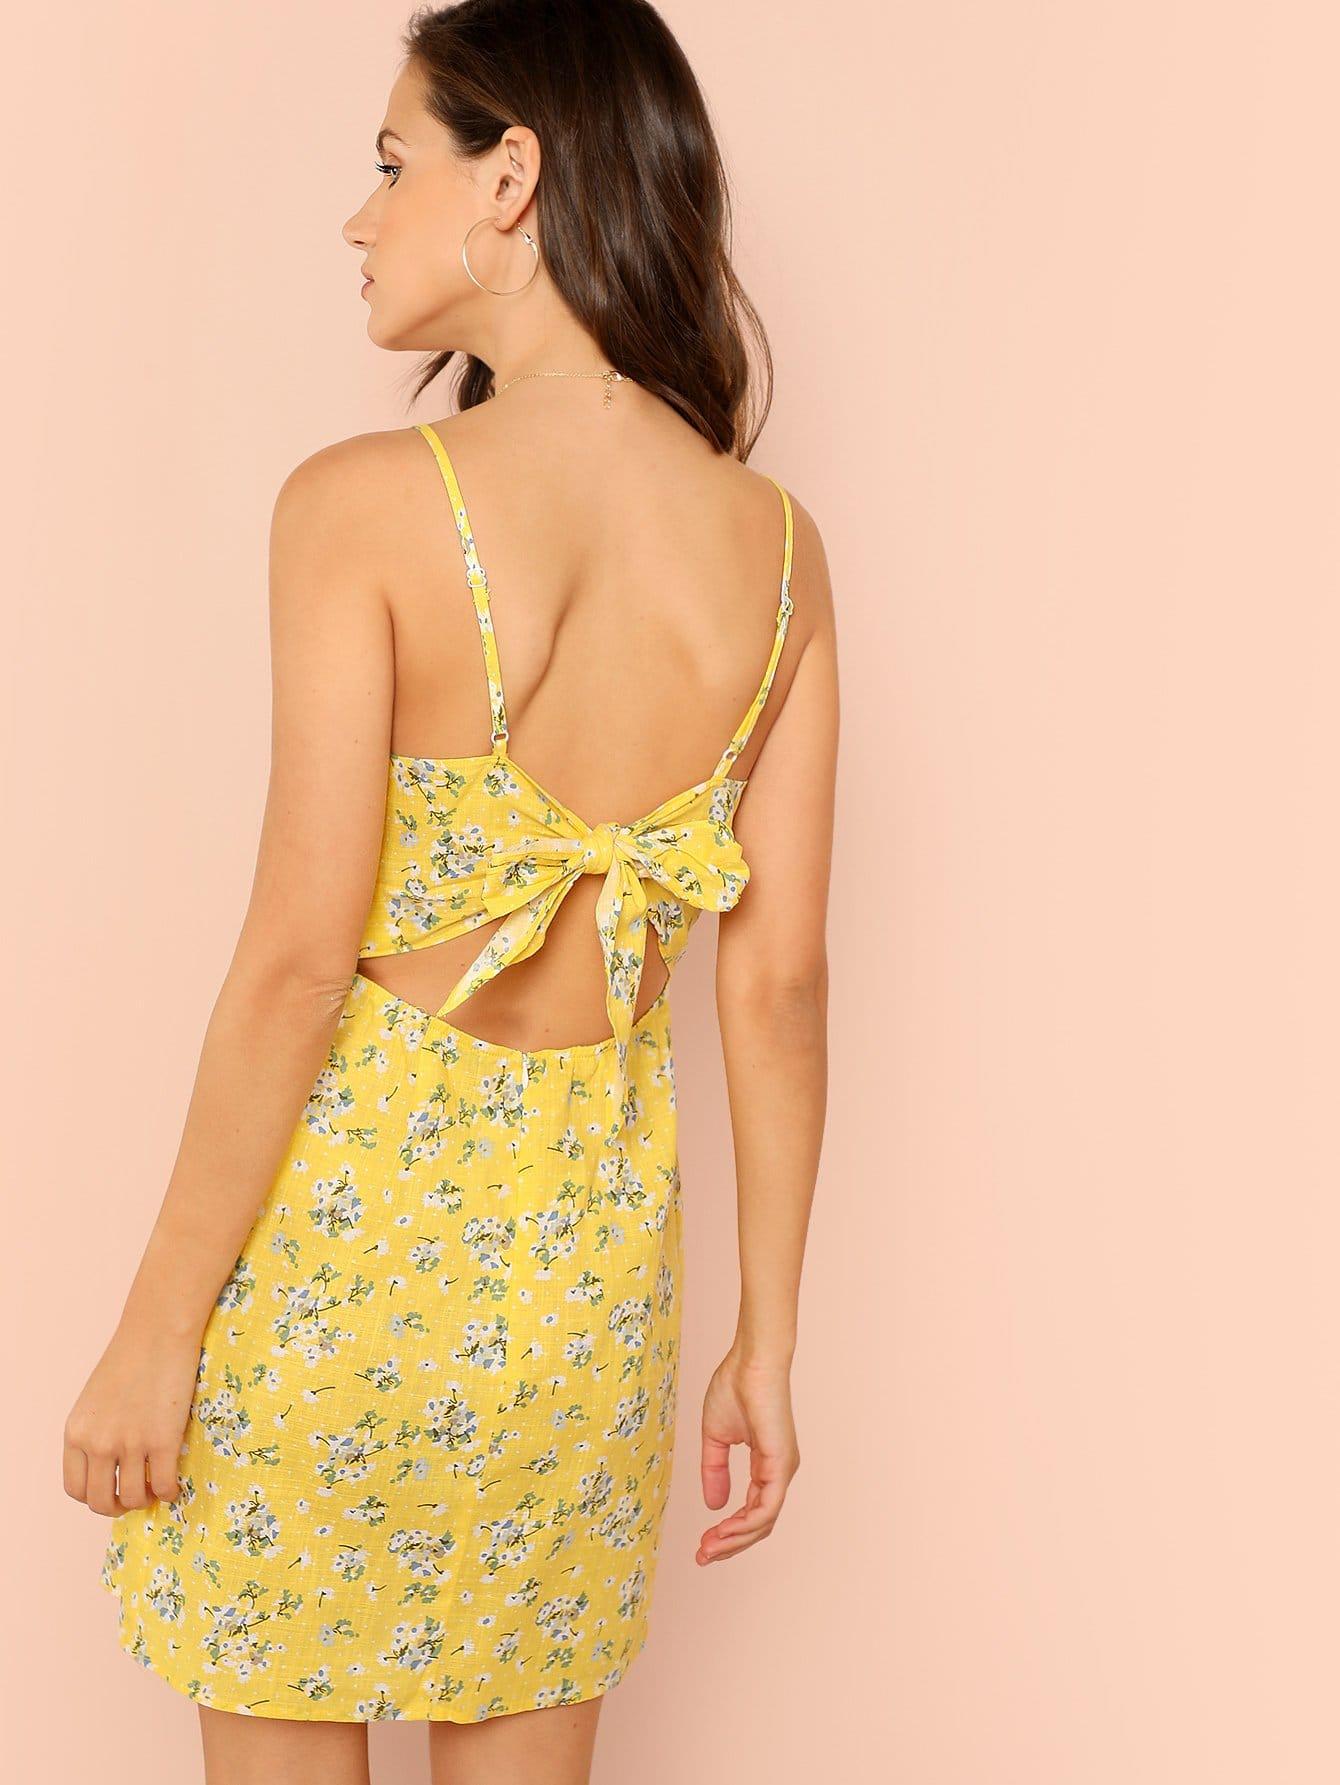 Allover Floral Print Ками платье